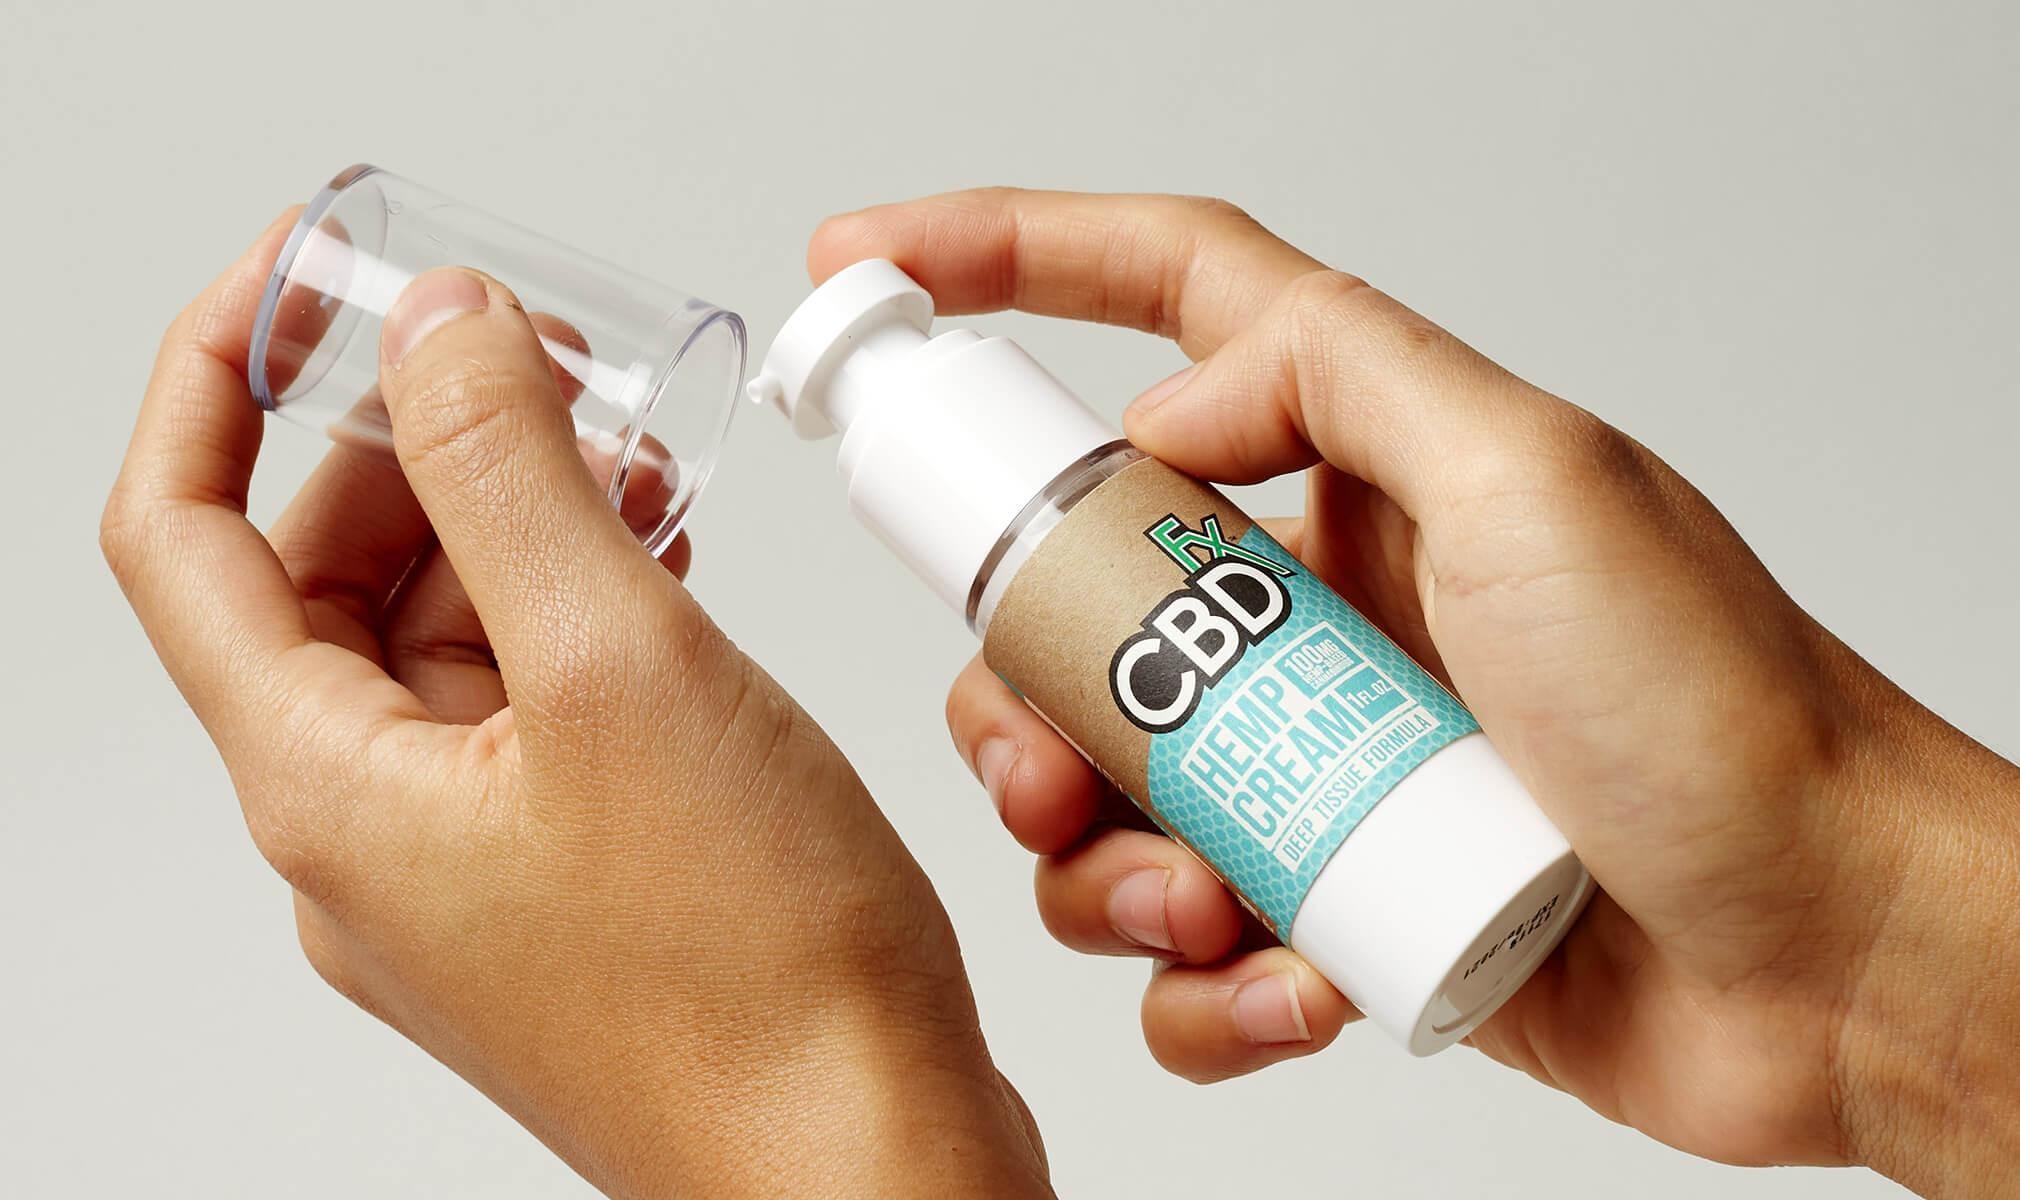 CBD Cream for Eczema: Does it Work?